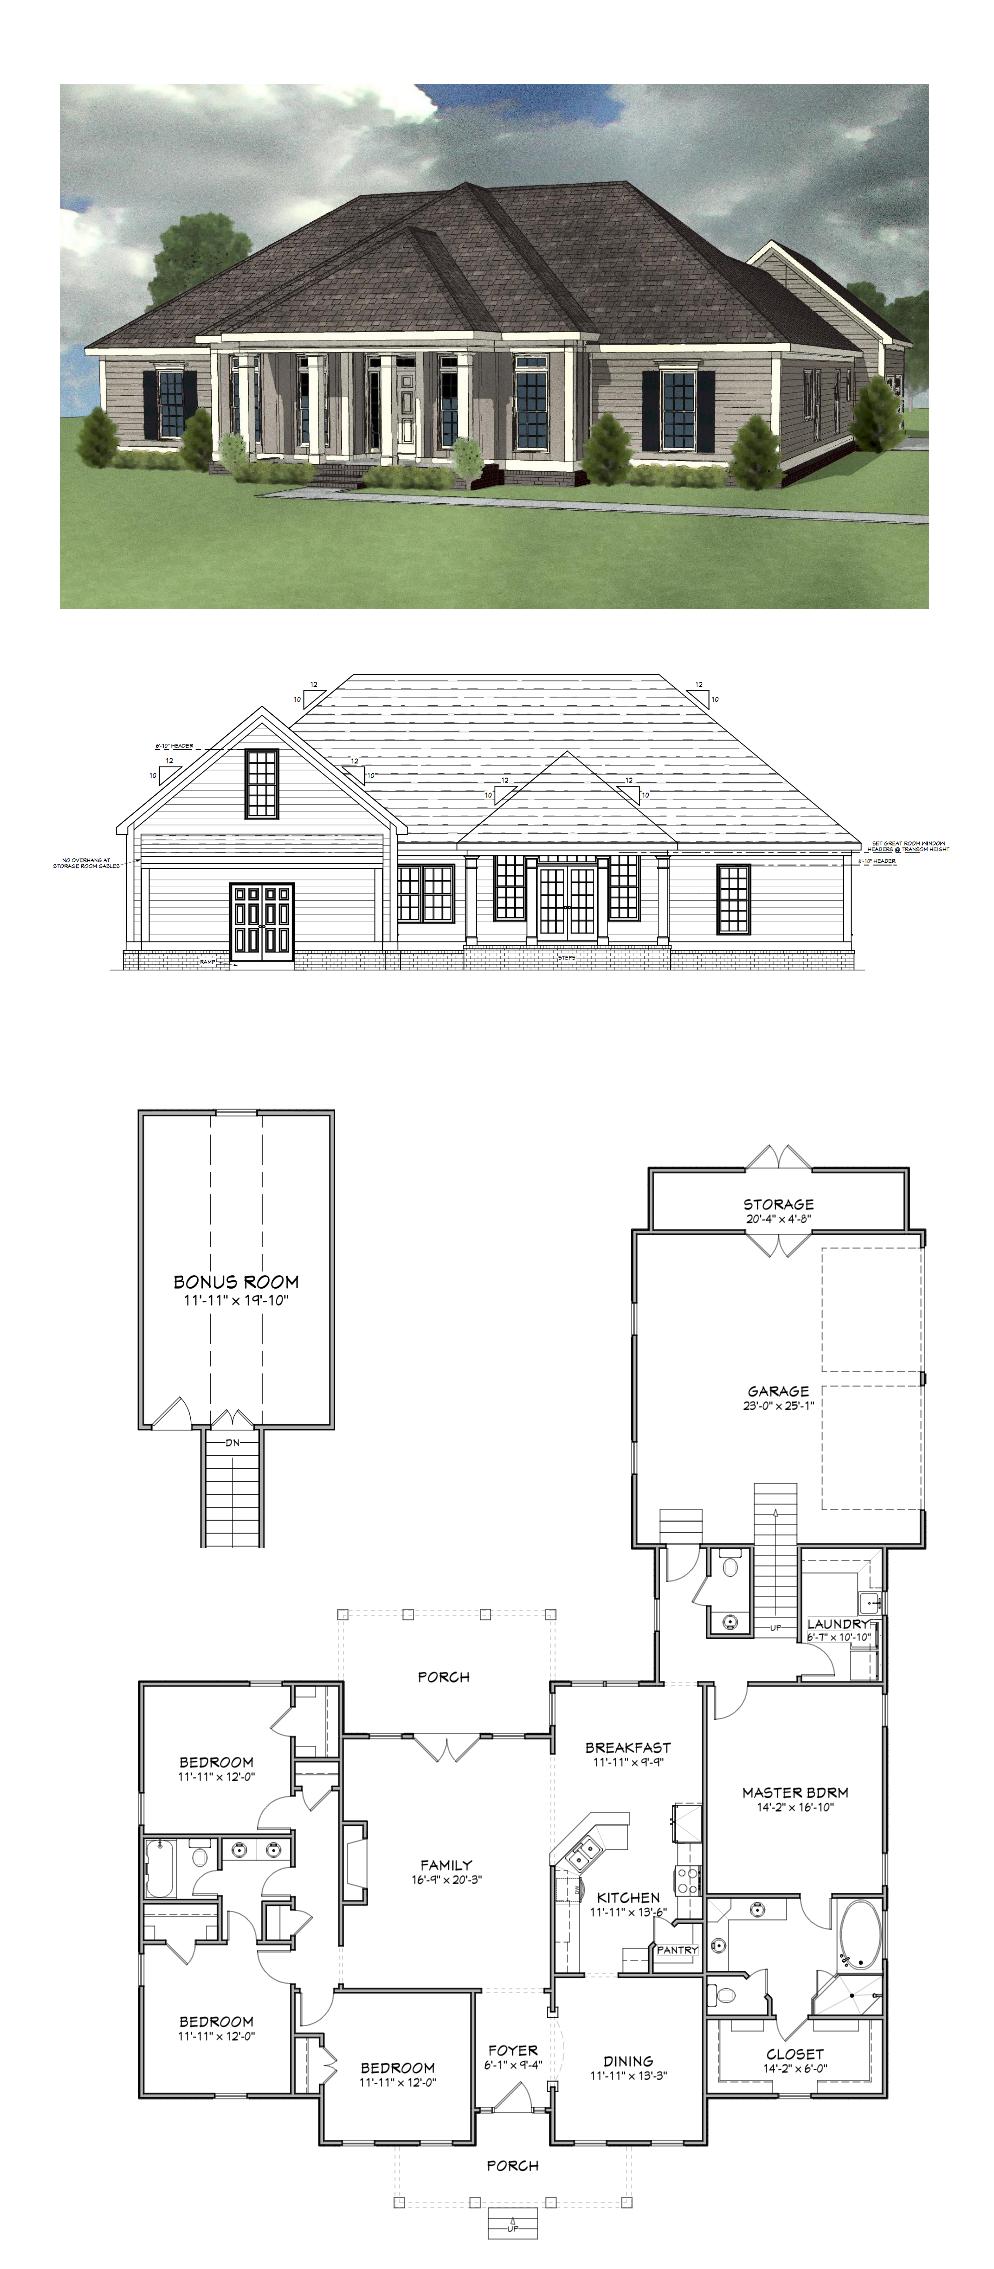 Plan SC2270 (770) 4 bedroom 2.5 bath home with 2270